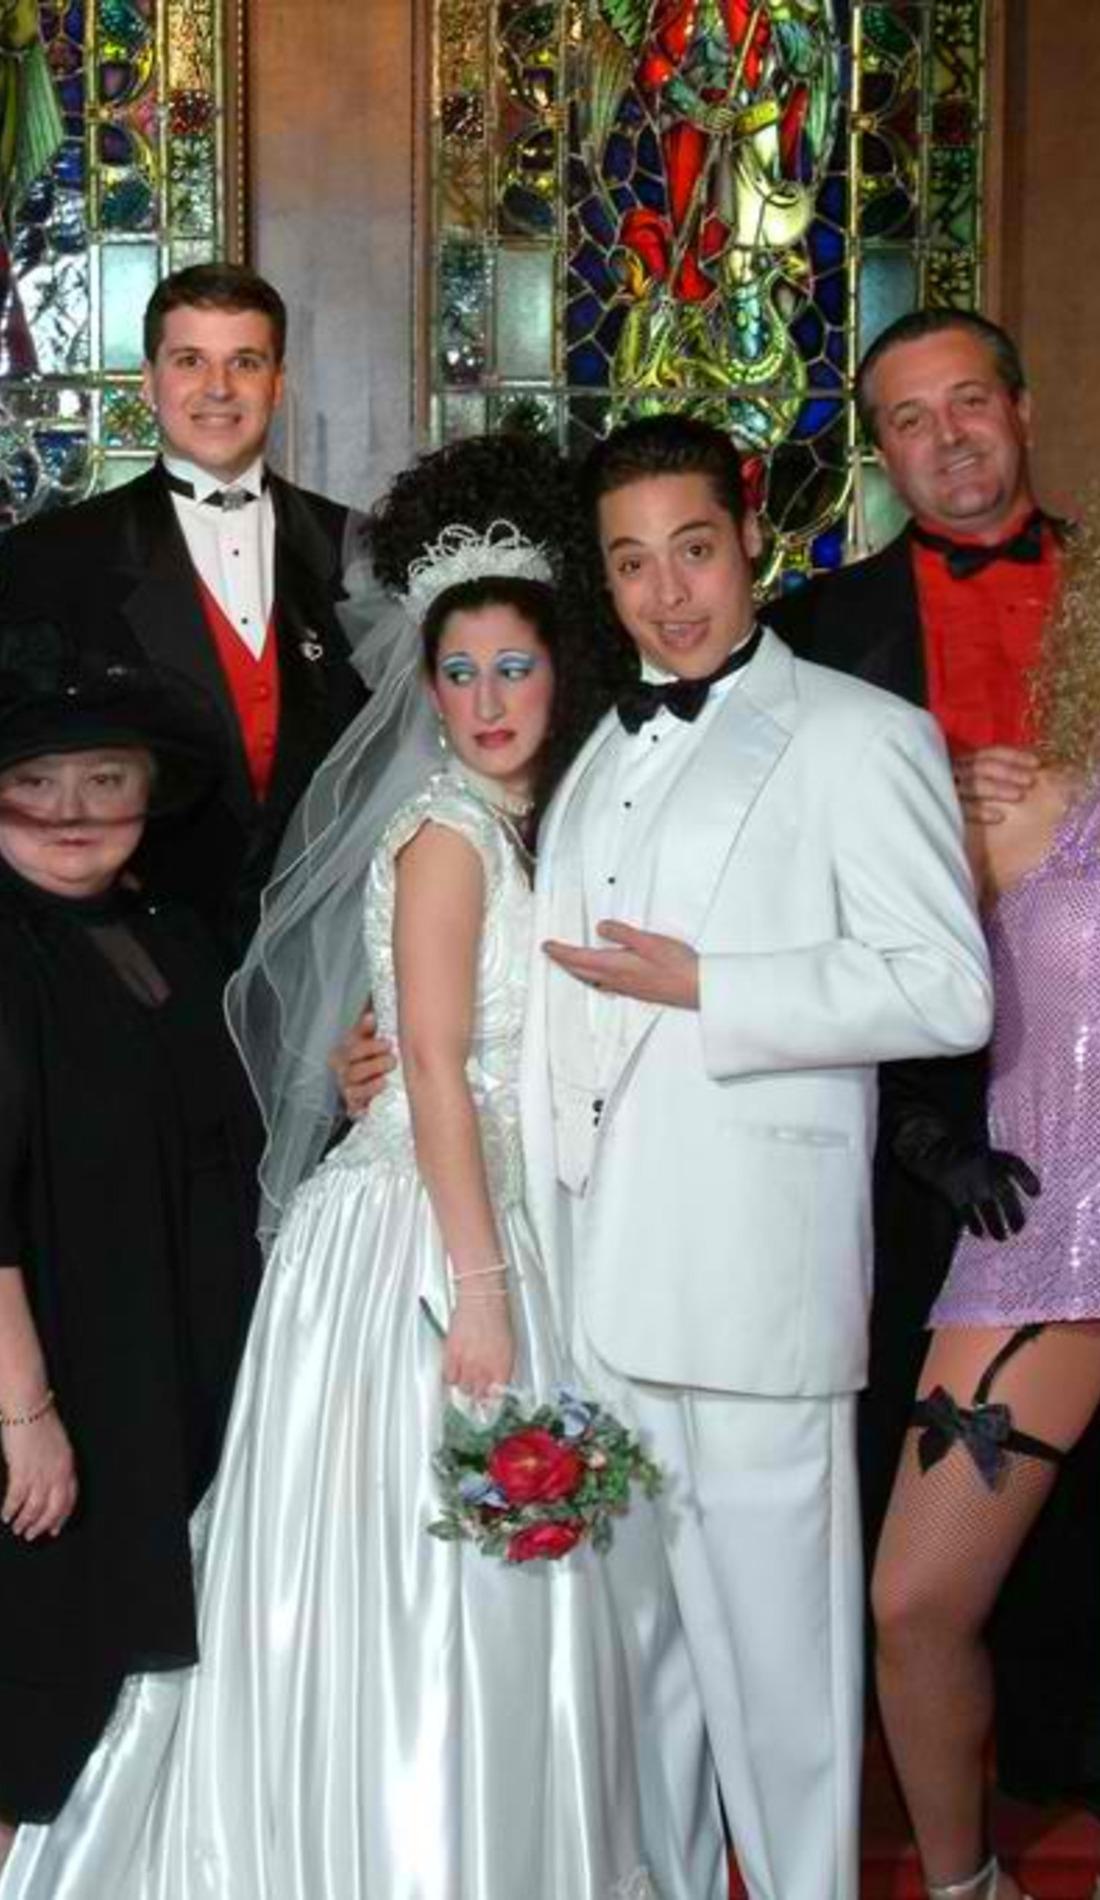 A Tony N' Tina's Wedding live event